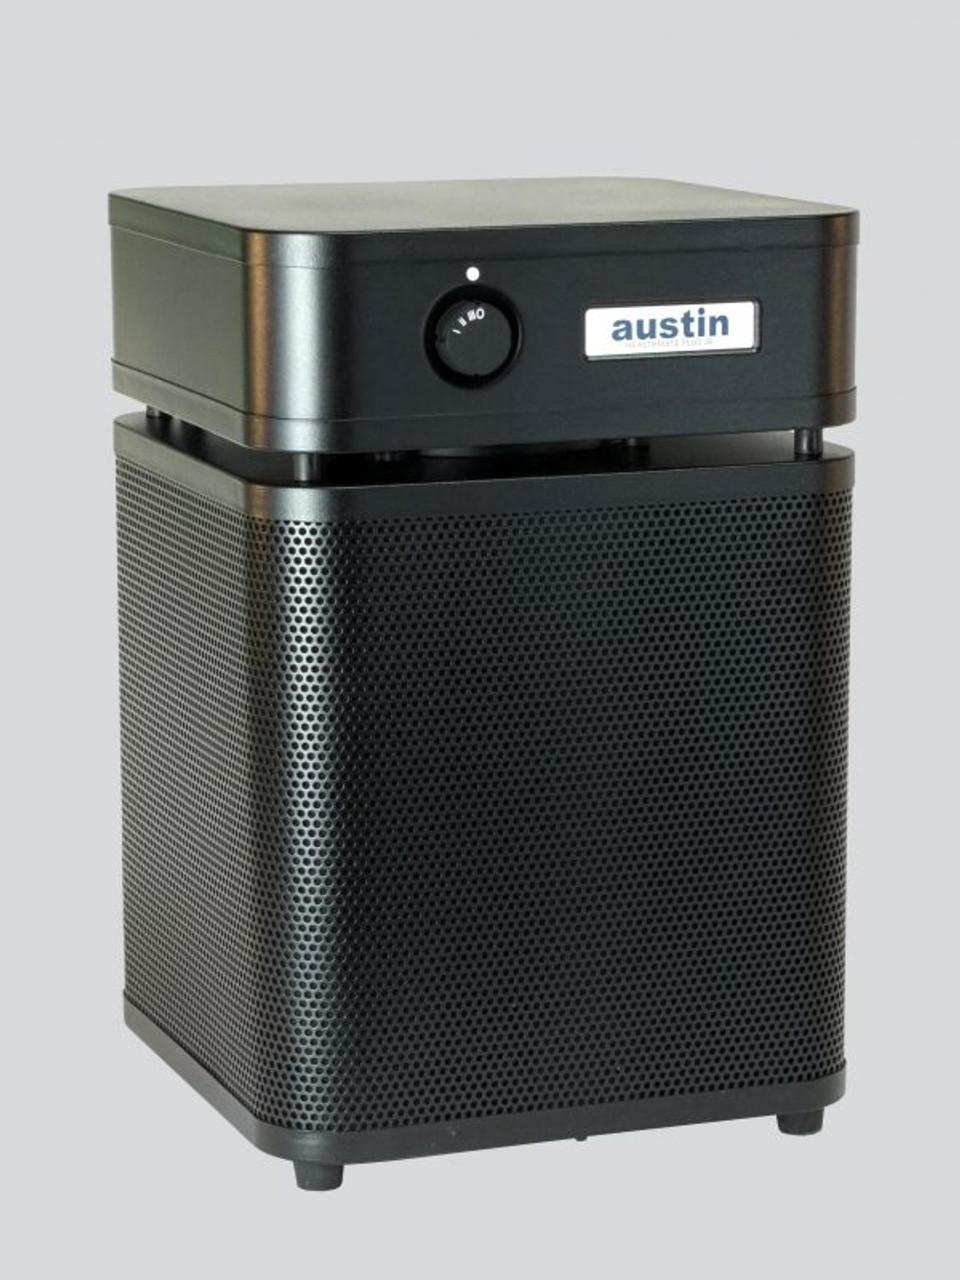 Austin Air Healthmate Plus Jr Air Purifier With Hepa Filter